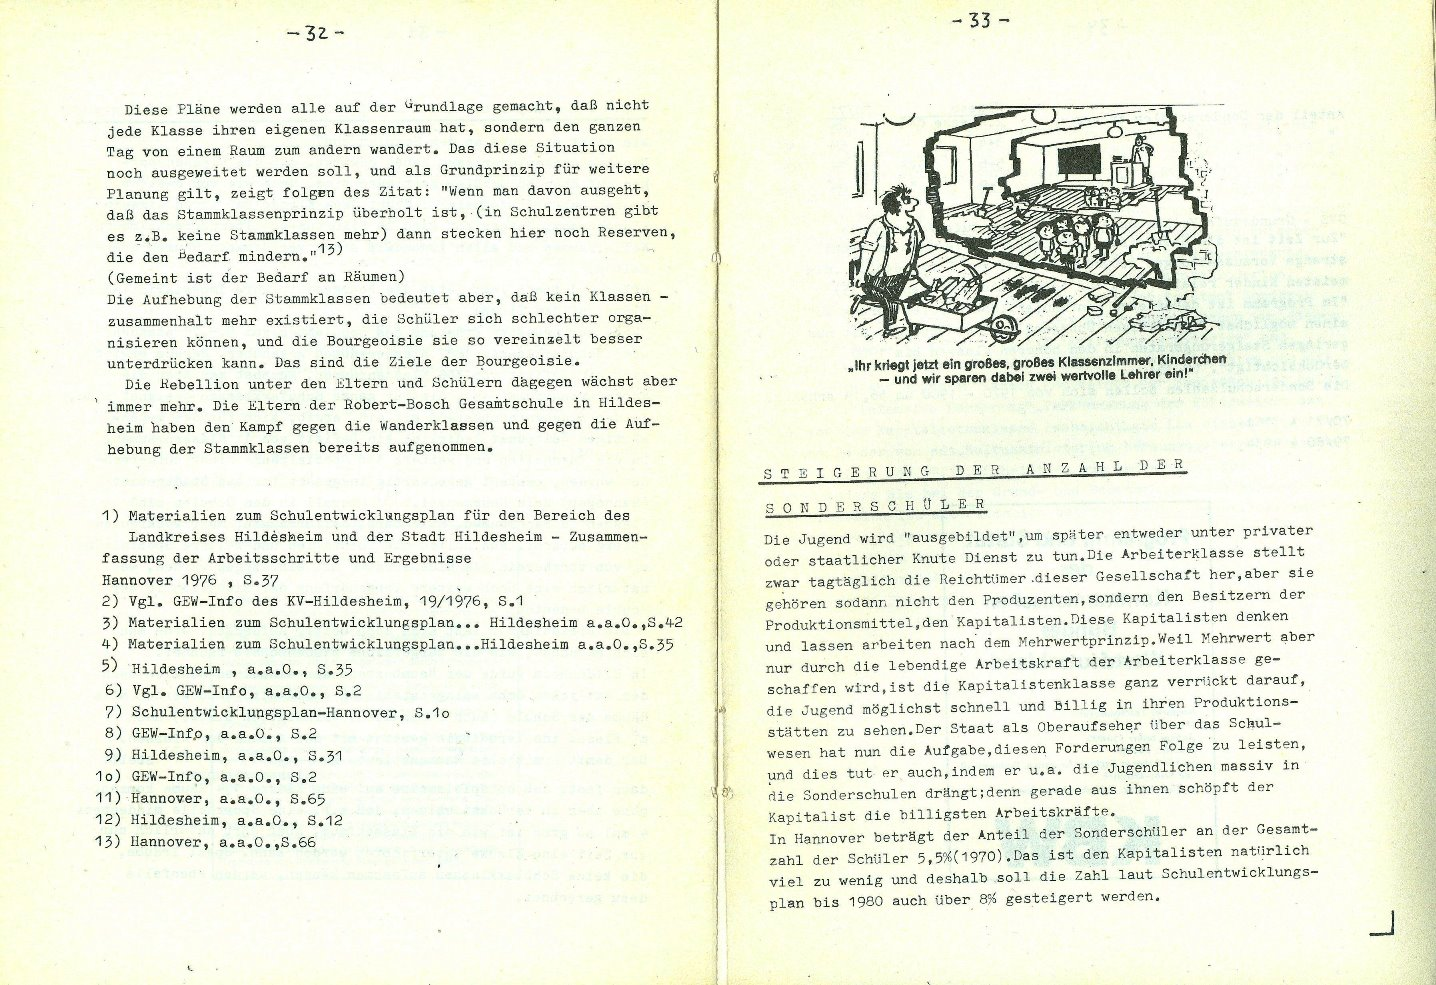 Hannover_GUV_Schulwesen020